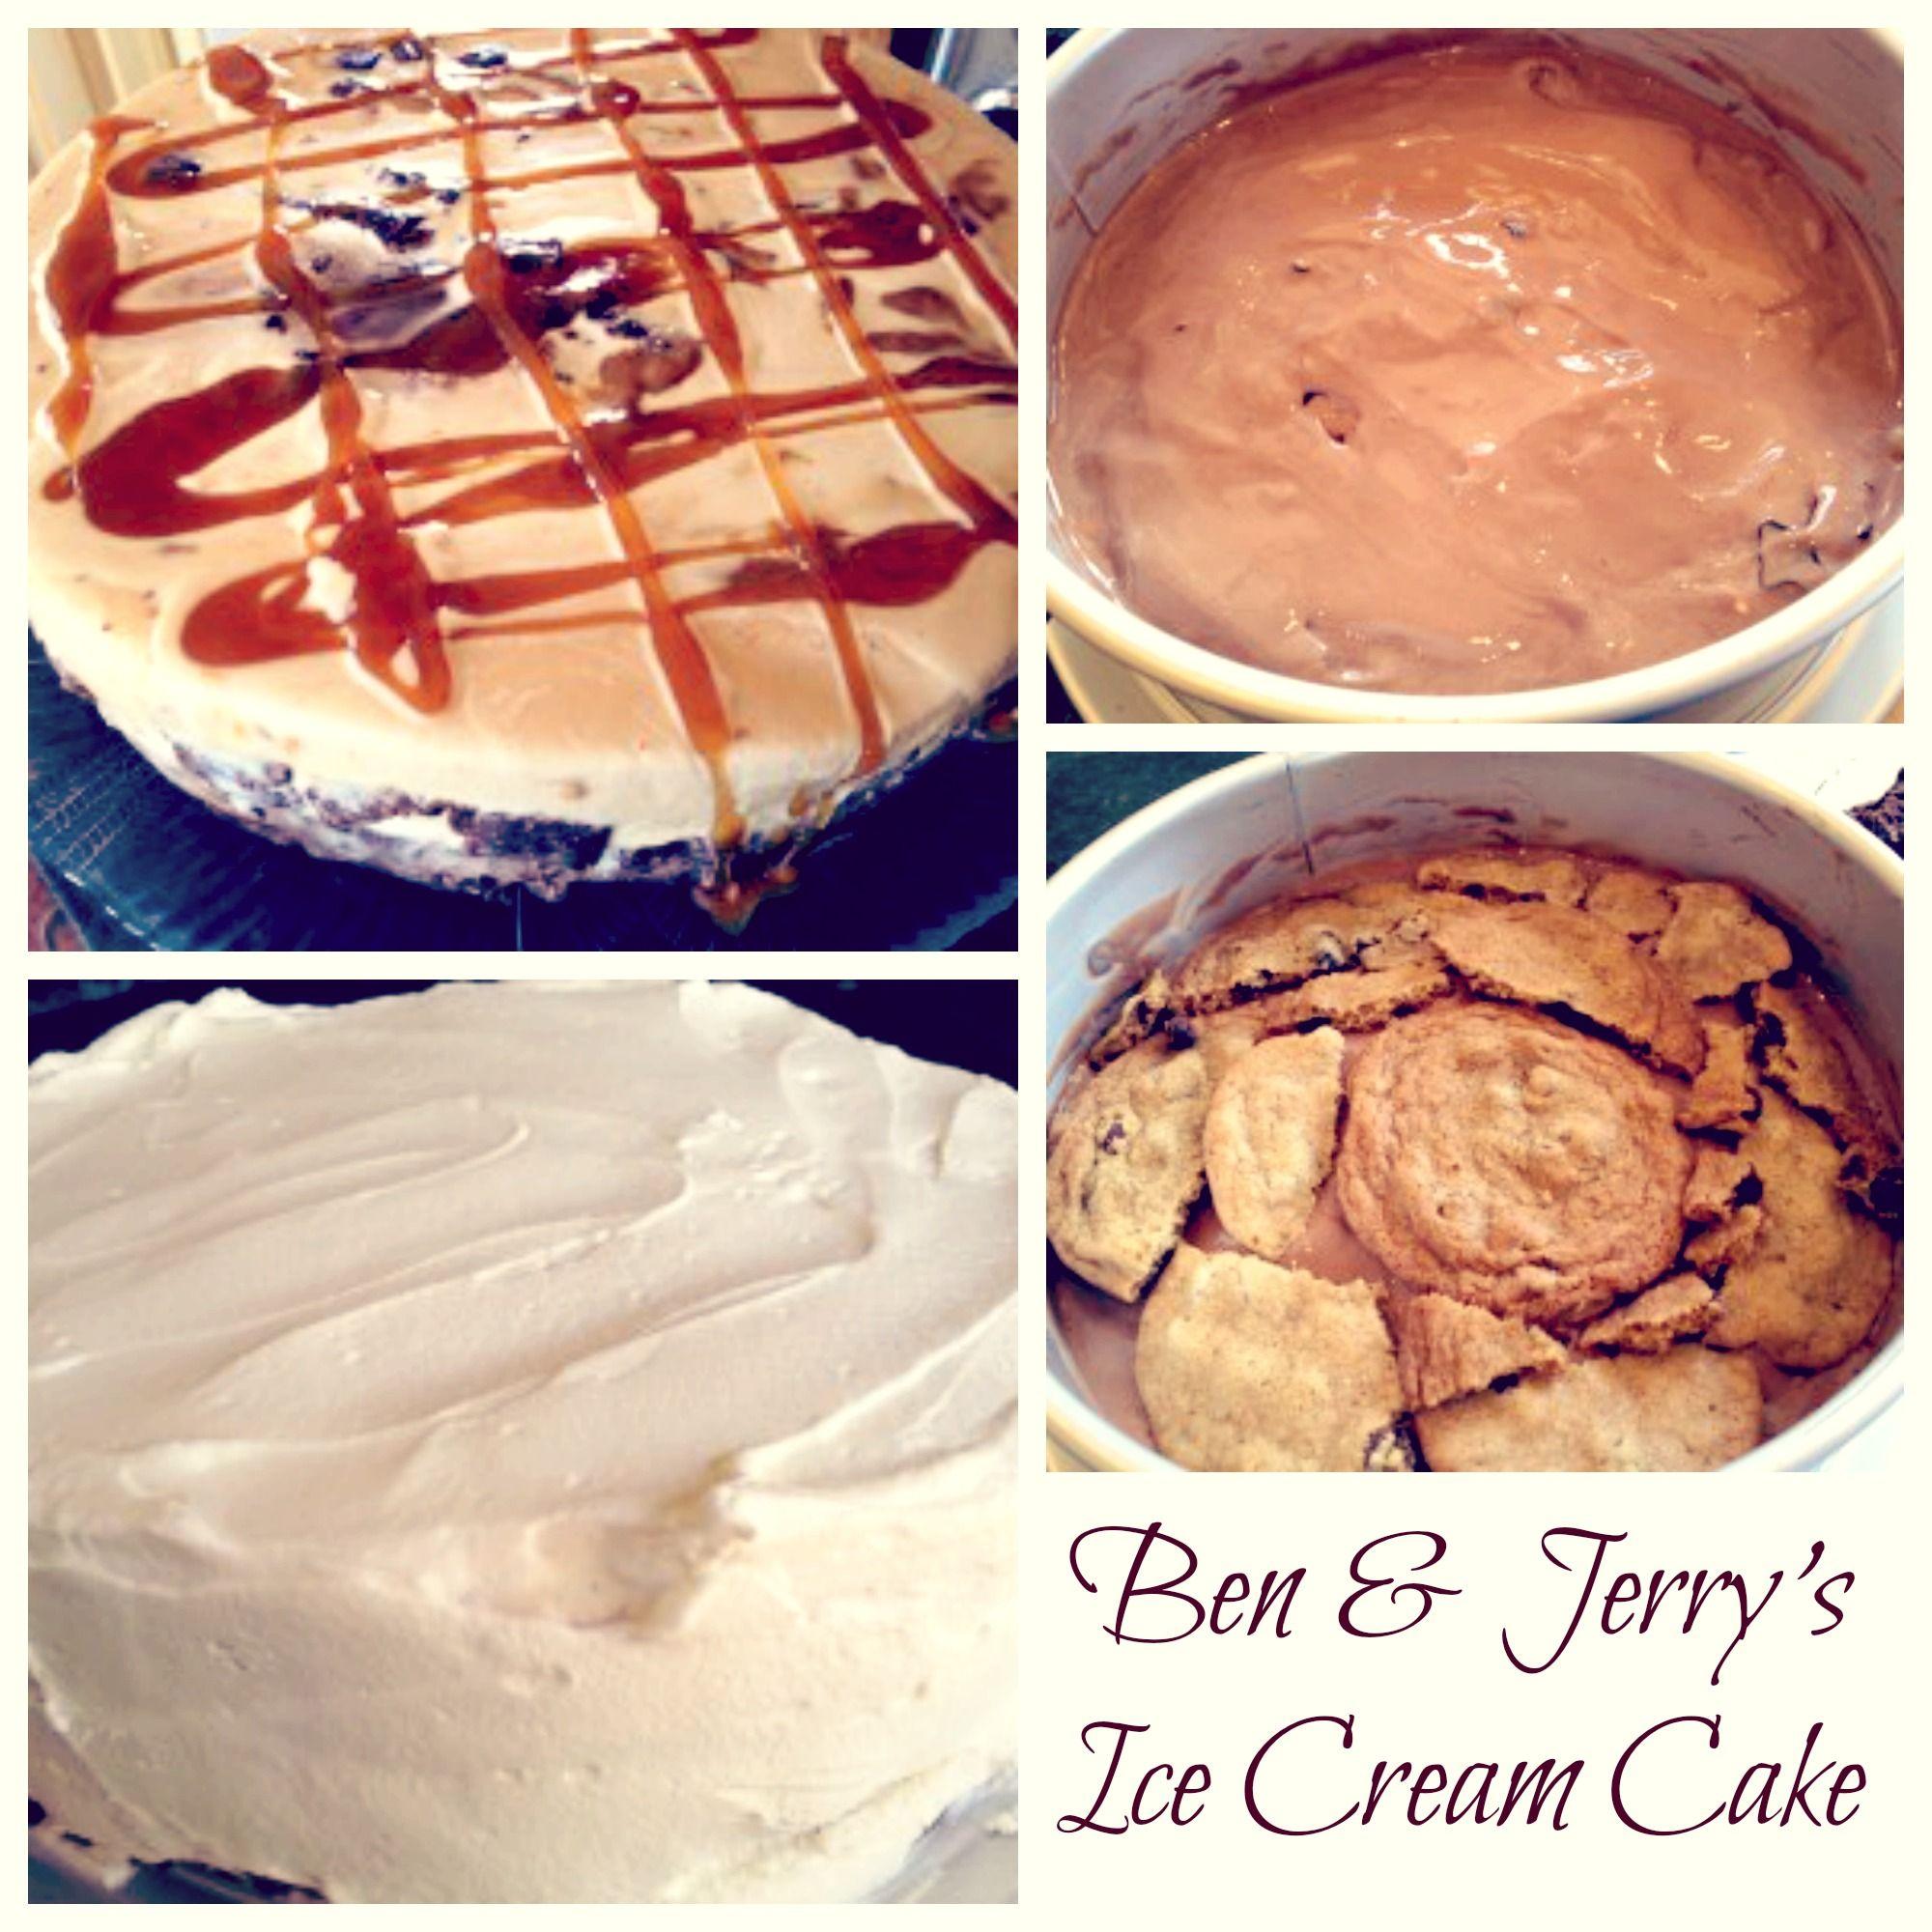 Ben jerrys ice cream cake ice cream cake kid